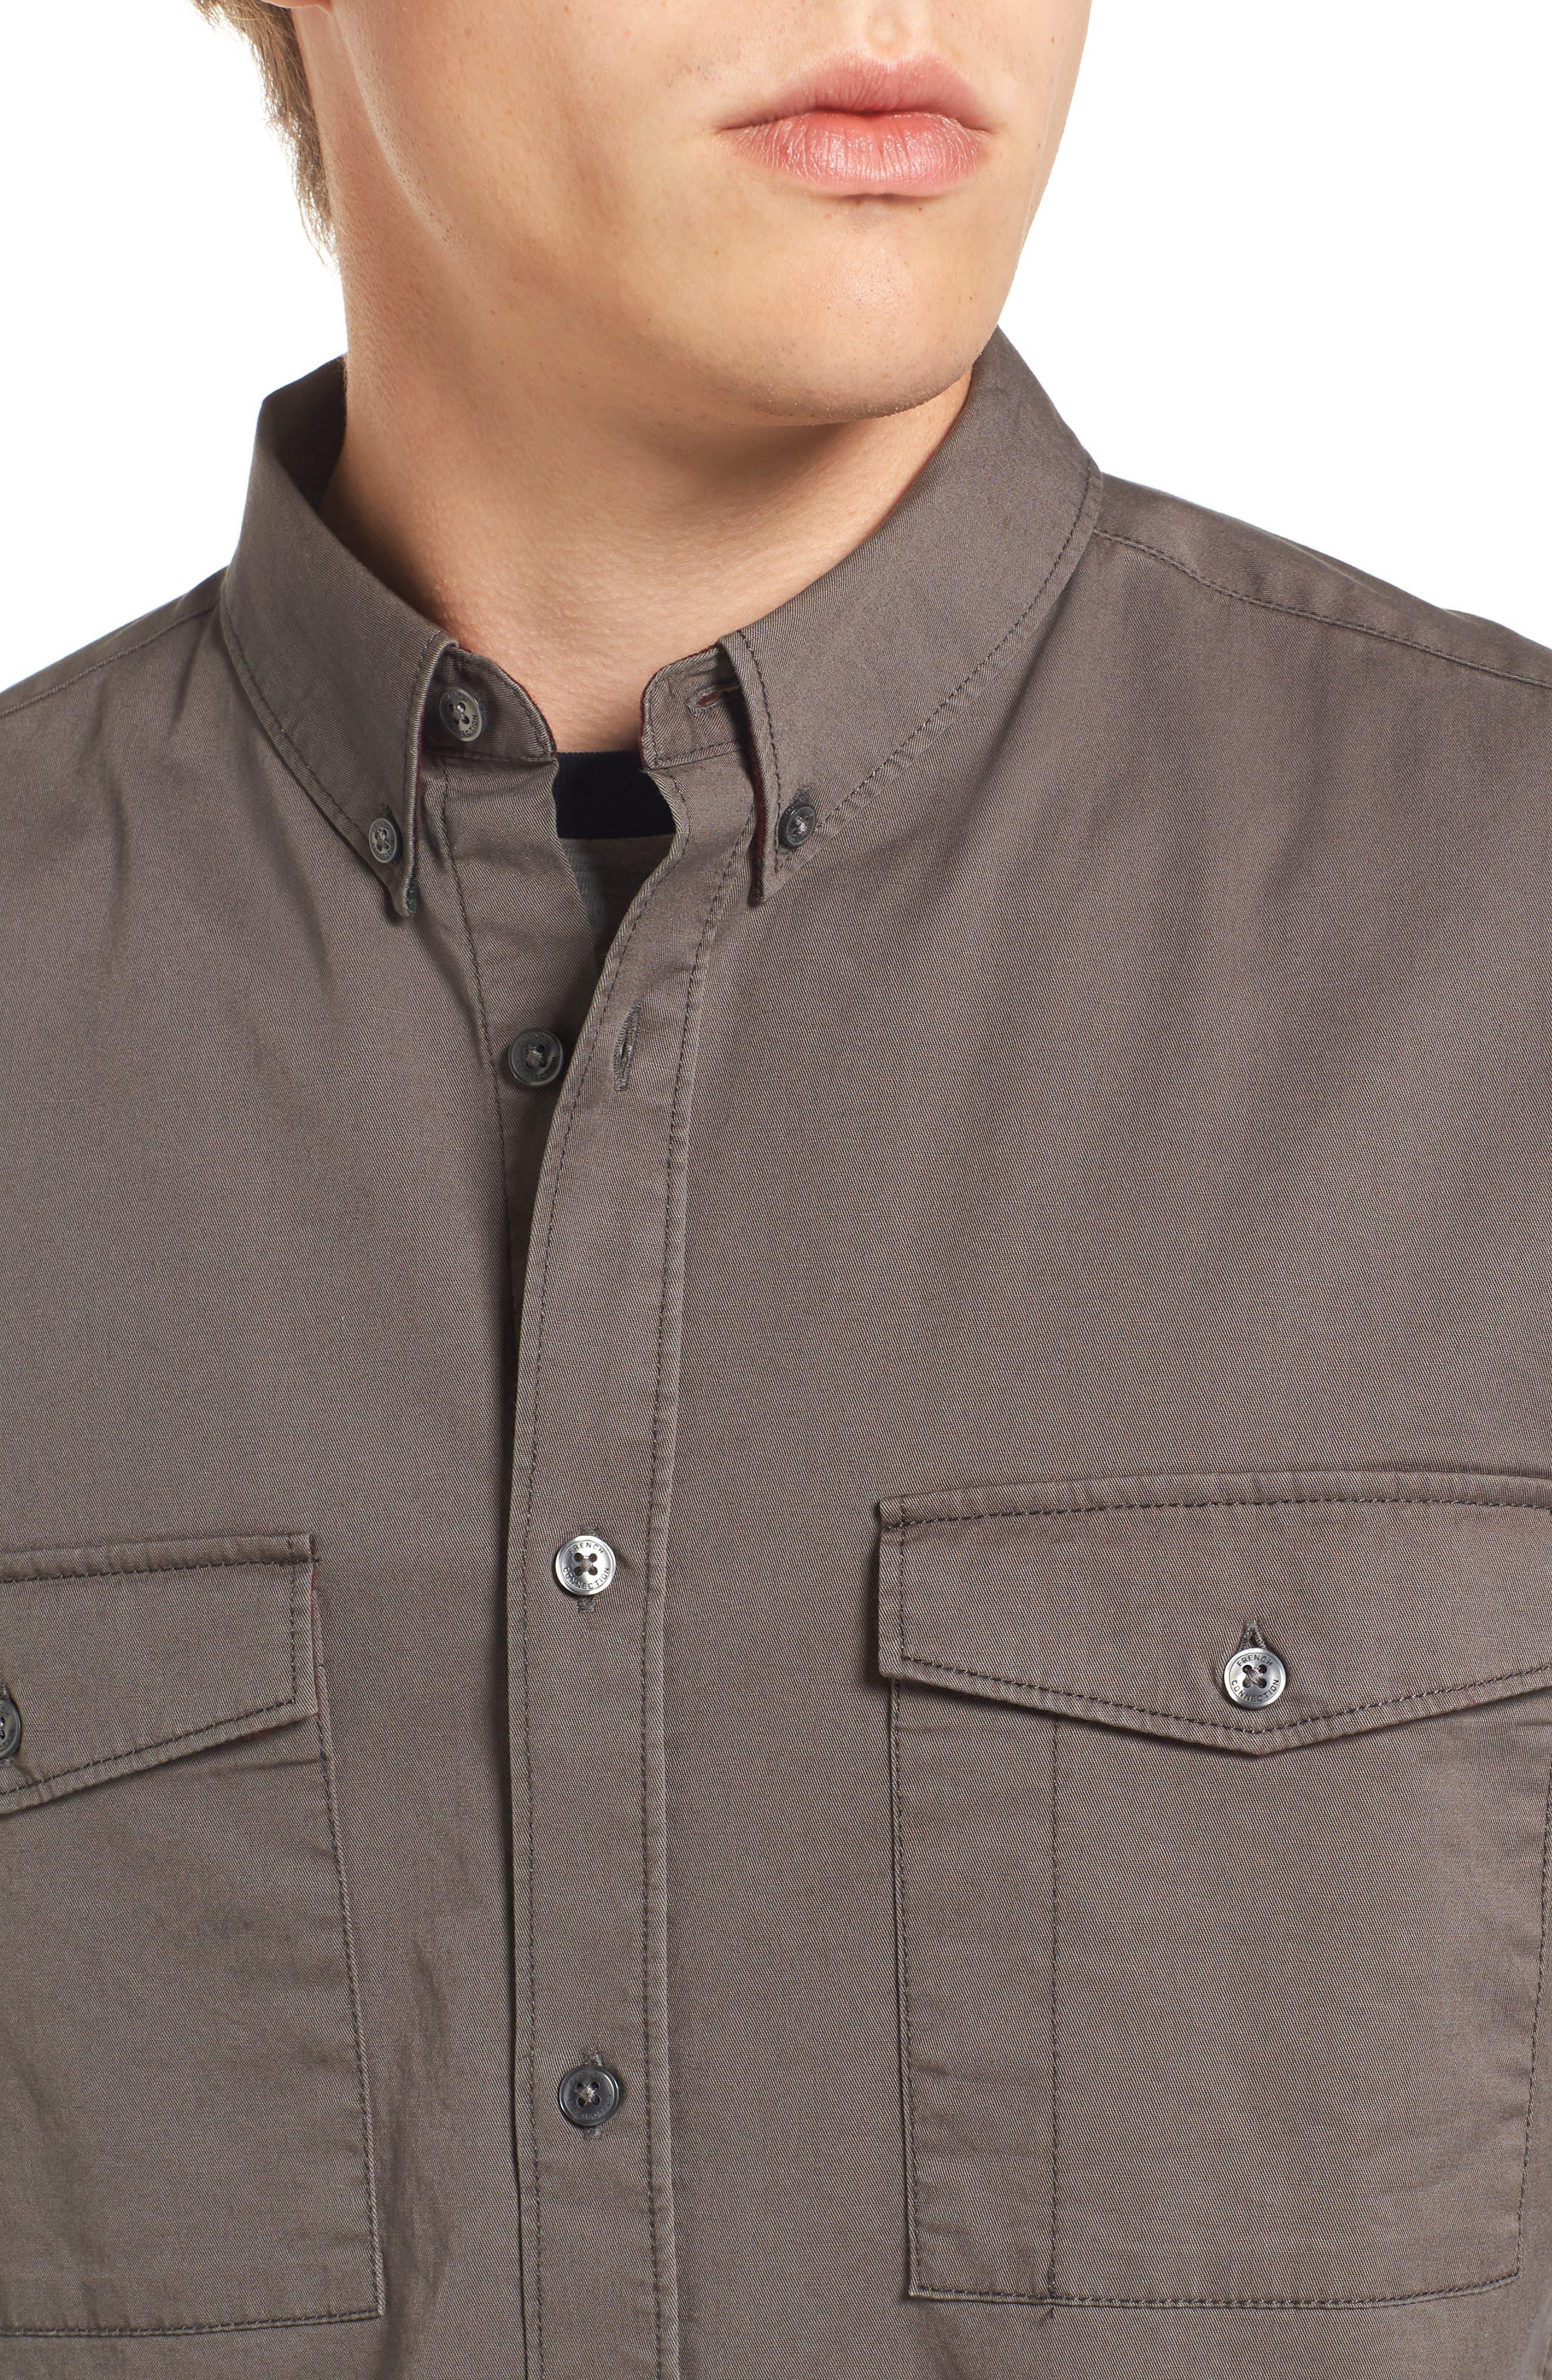 Regular Fit Twill Sport Shirt,                             Alternate thumbnail 4, color,                             201